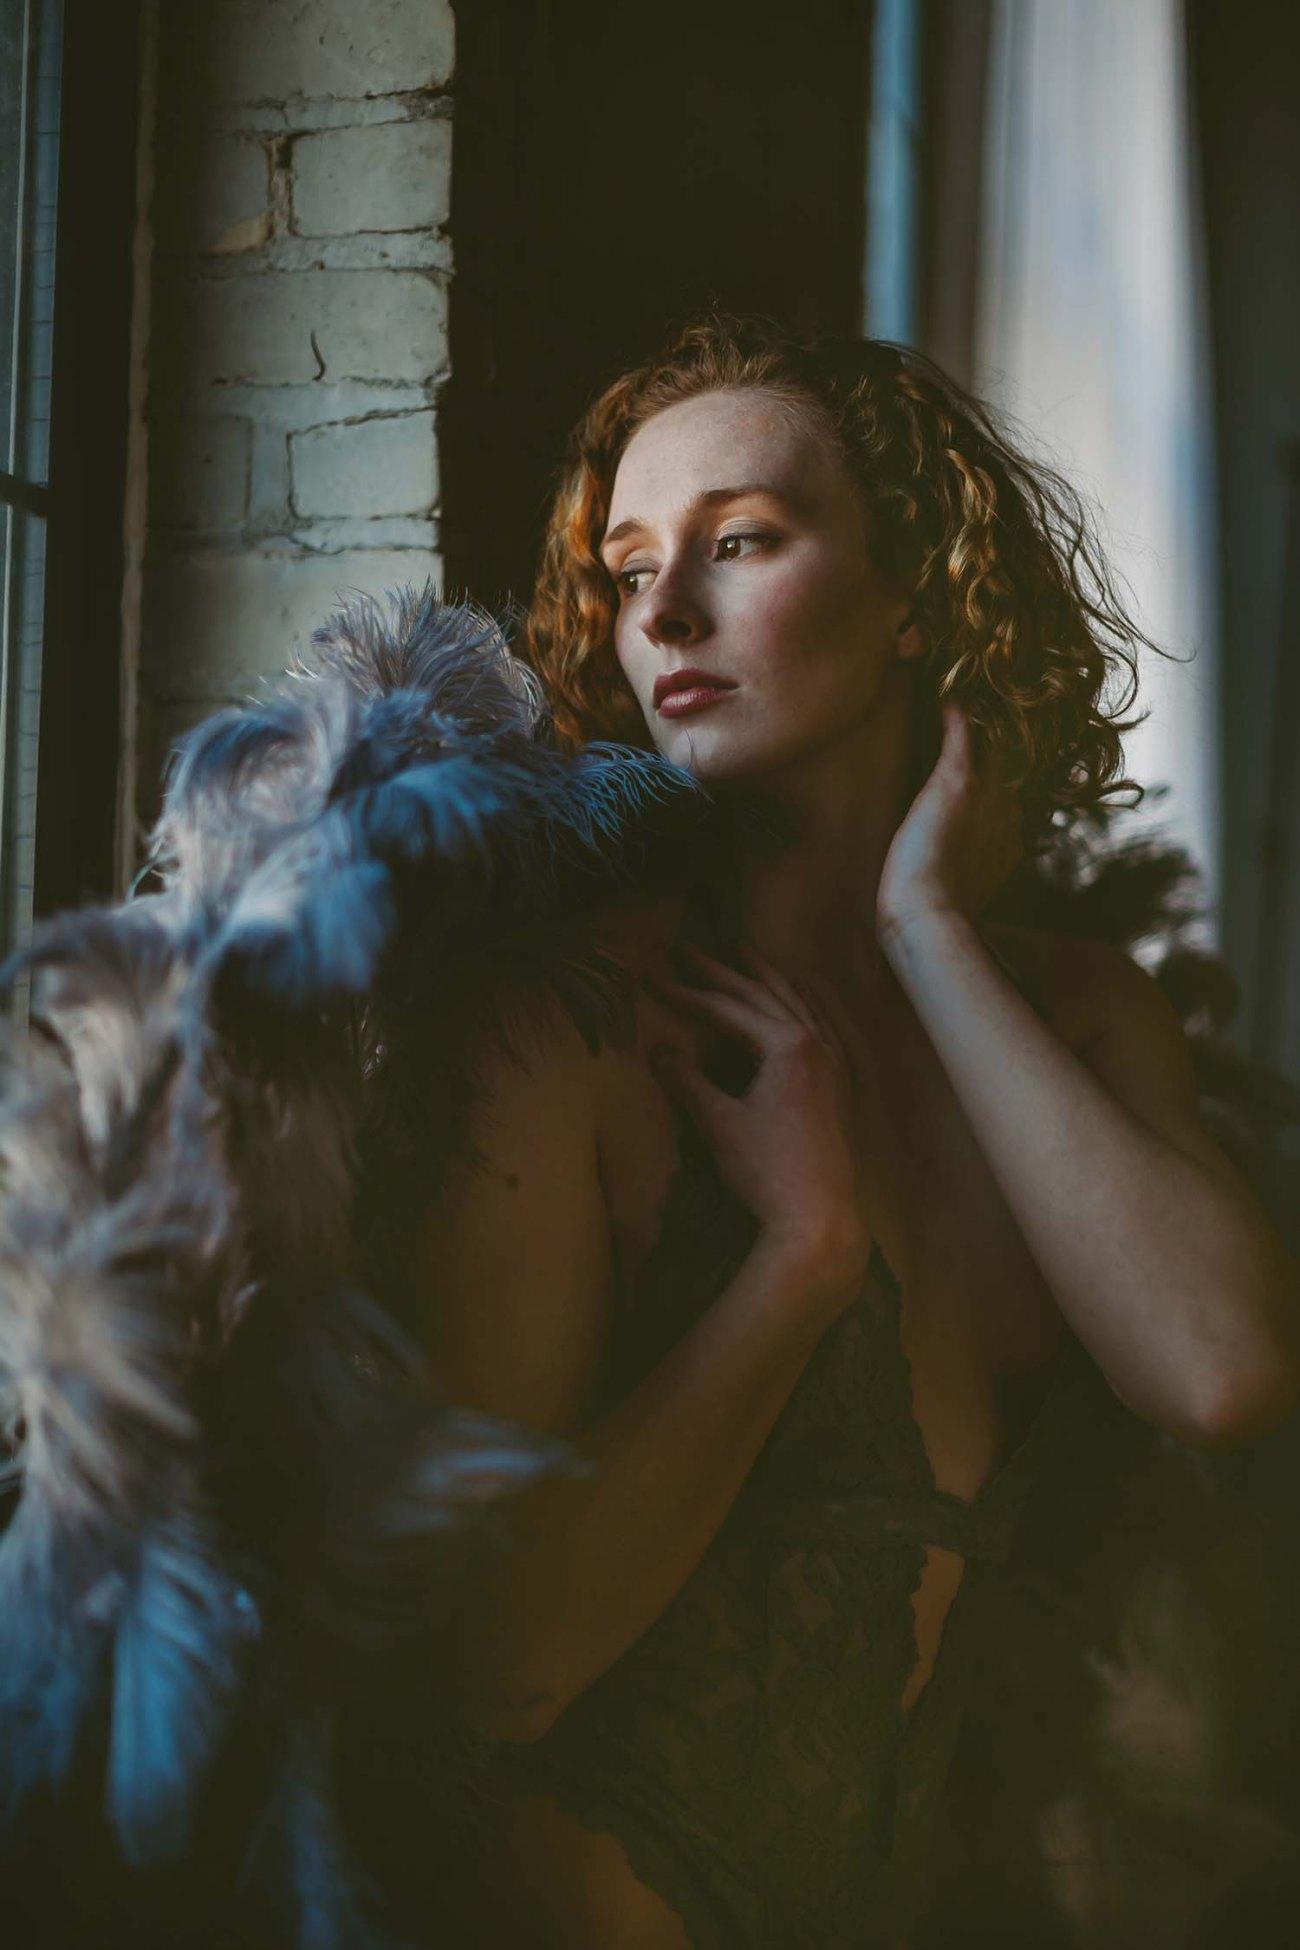 Woman dark moody portrait window natural light wings Minneapolis MN Minnesota photo studio